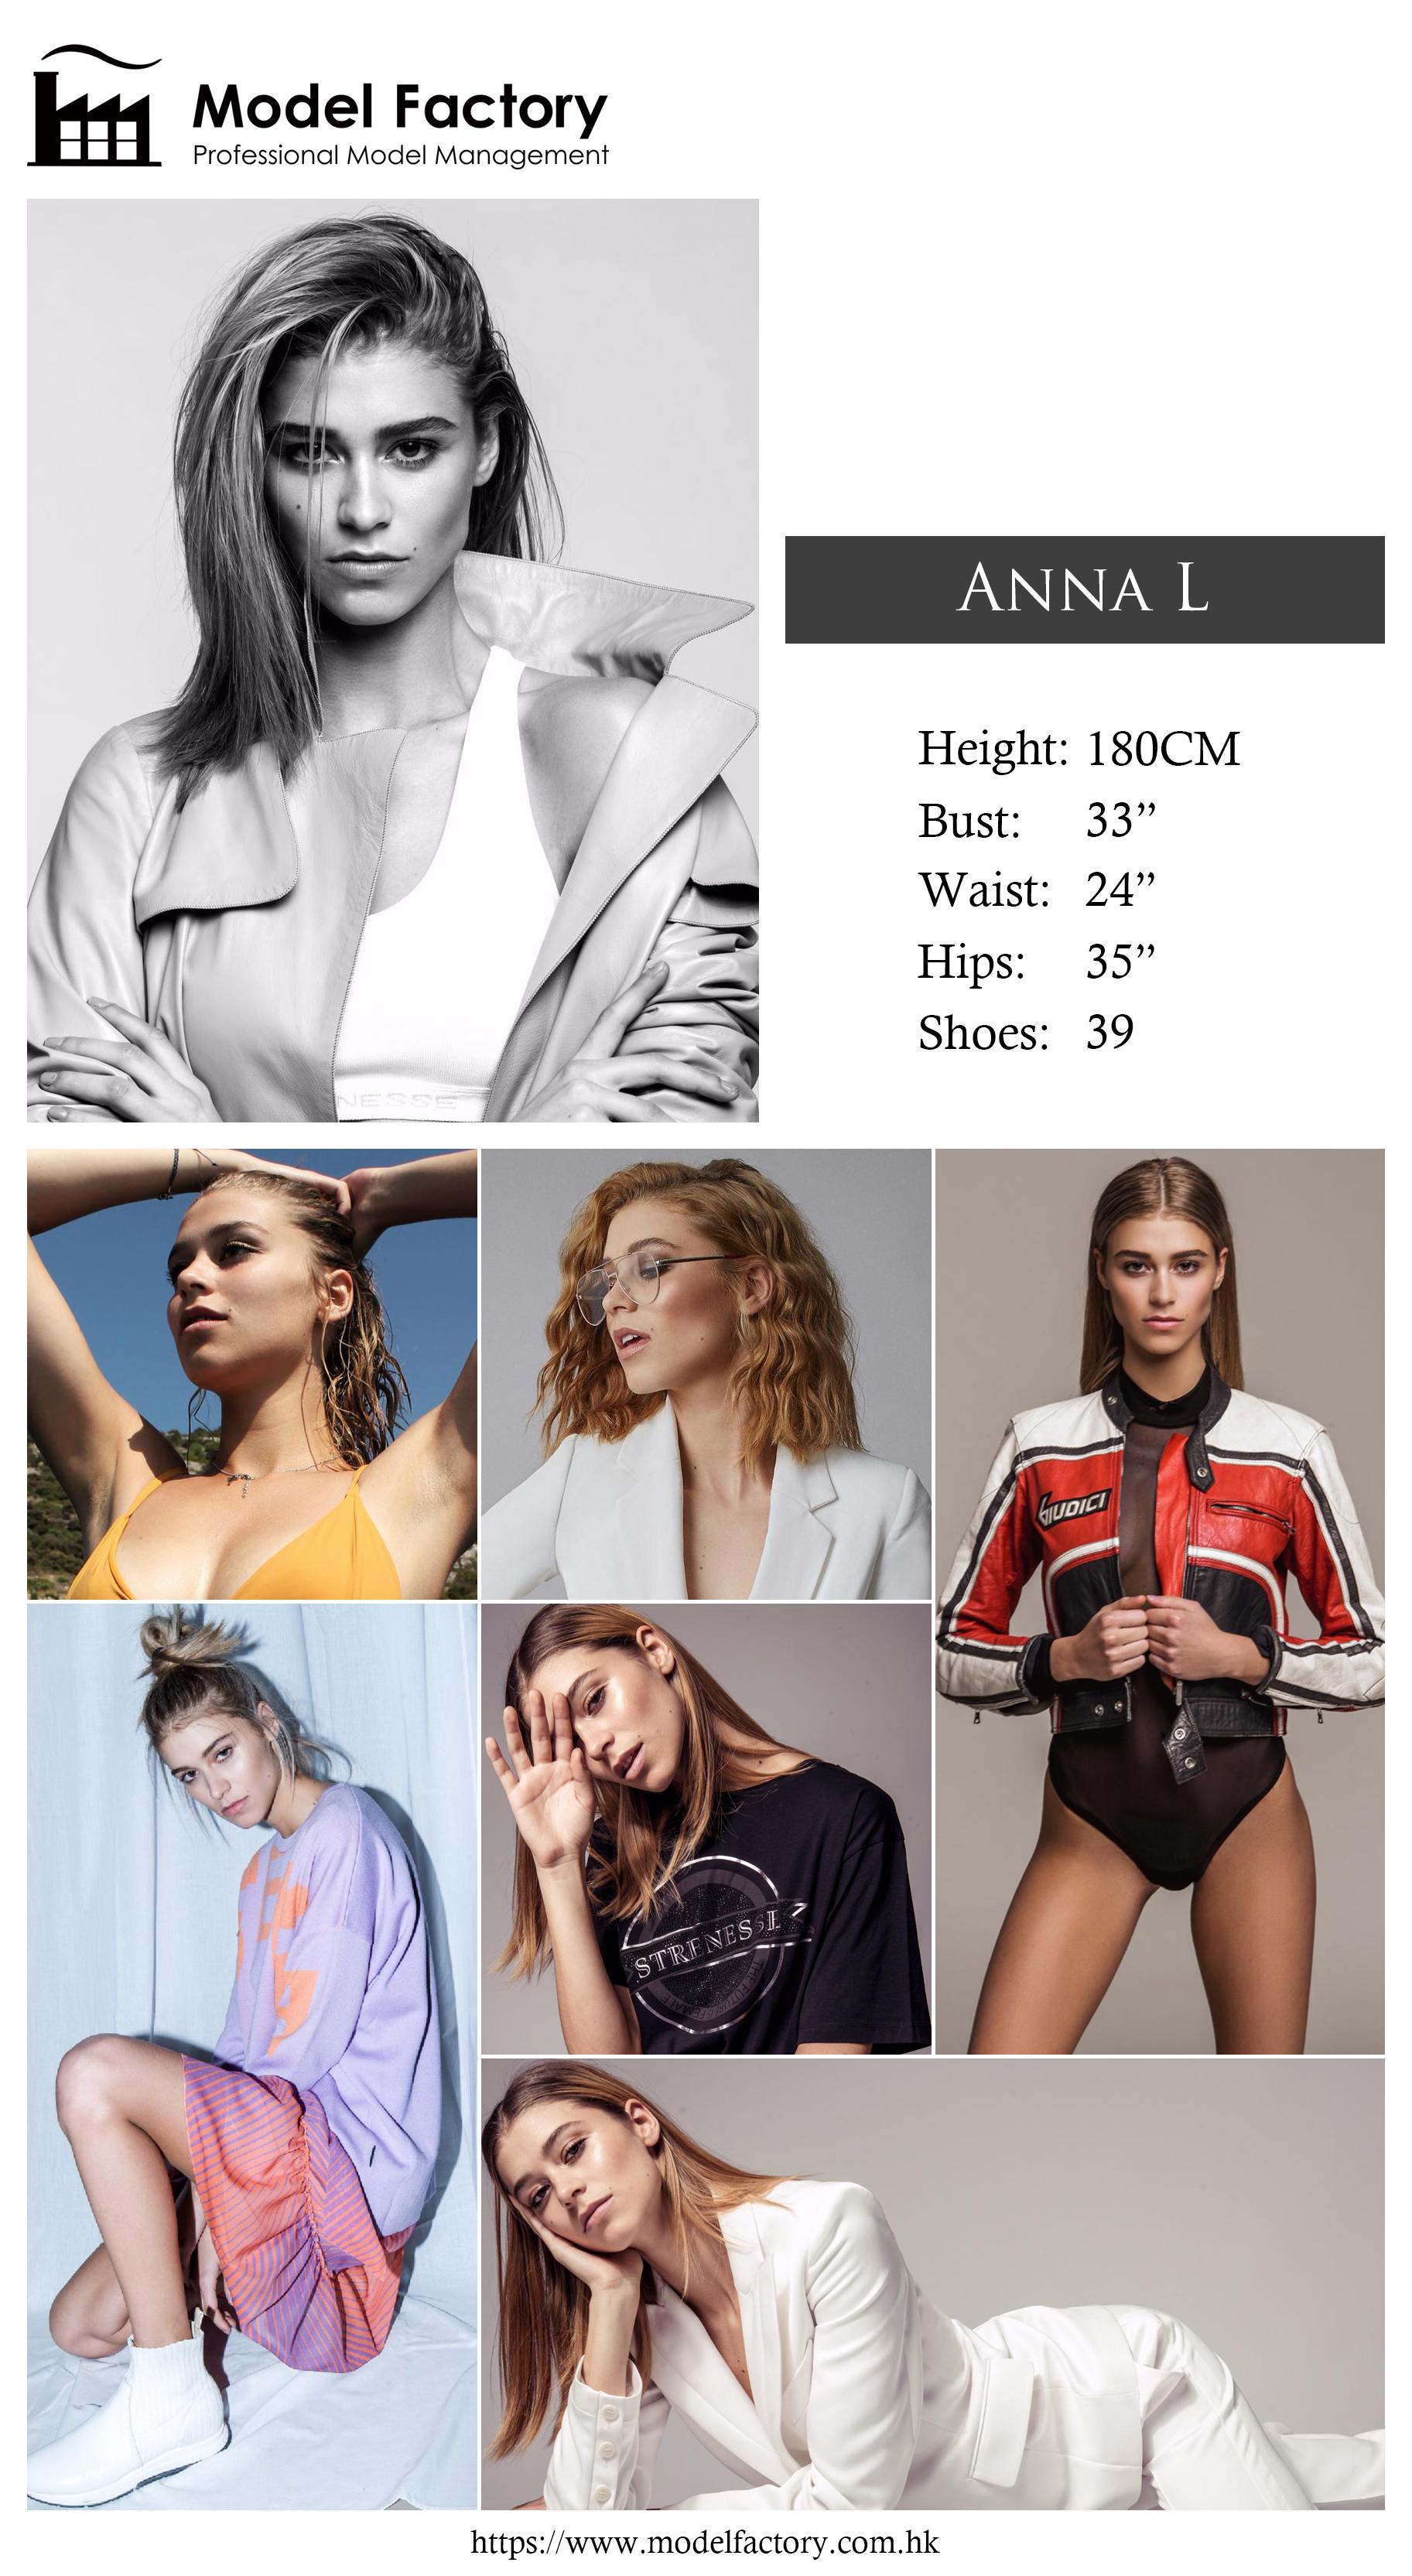 Model Factory Caucasian Female Model AnnaL